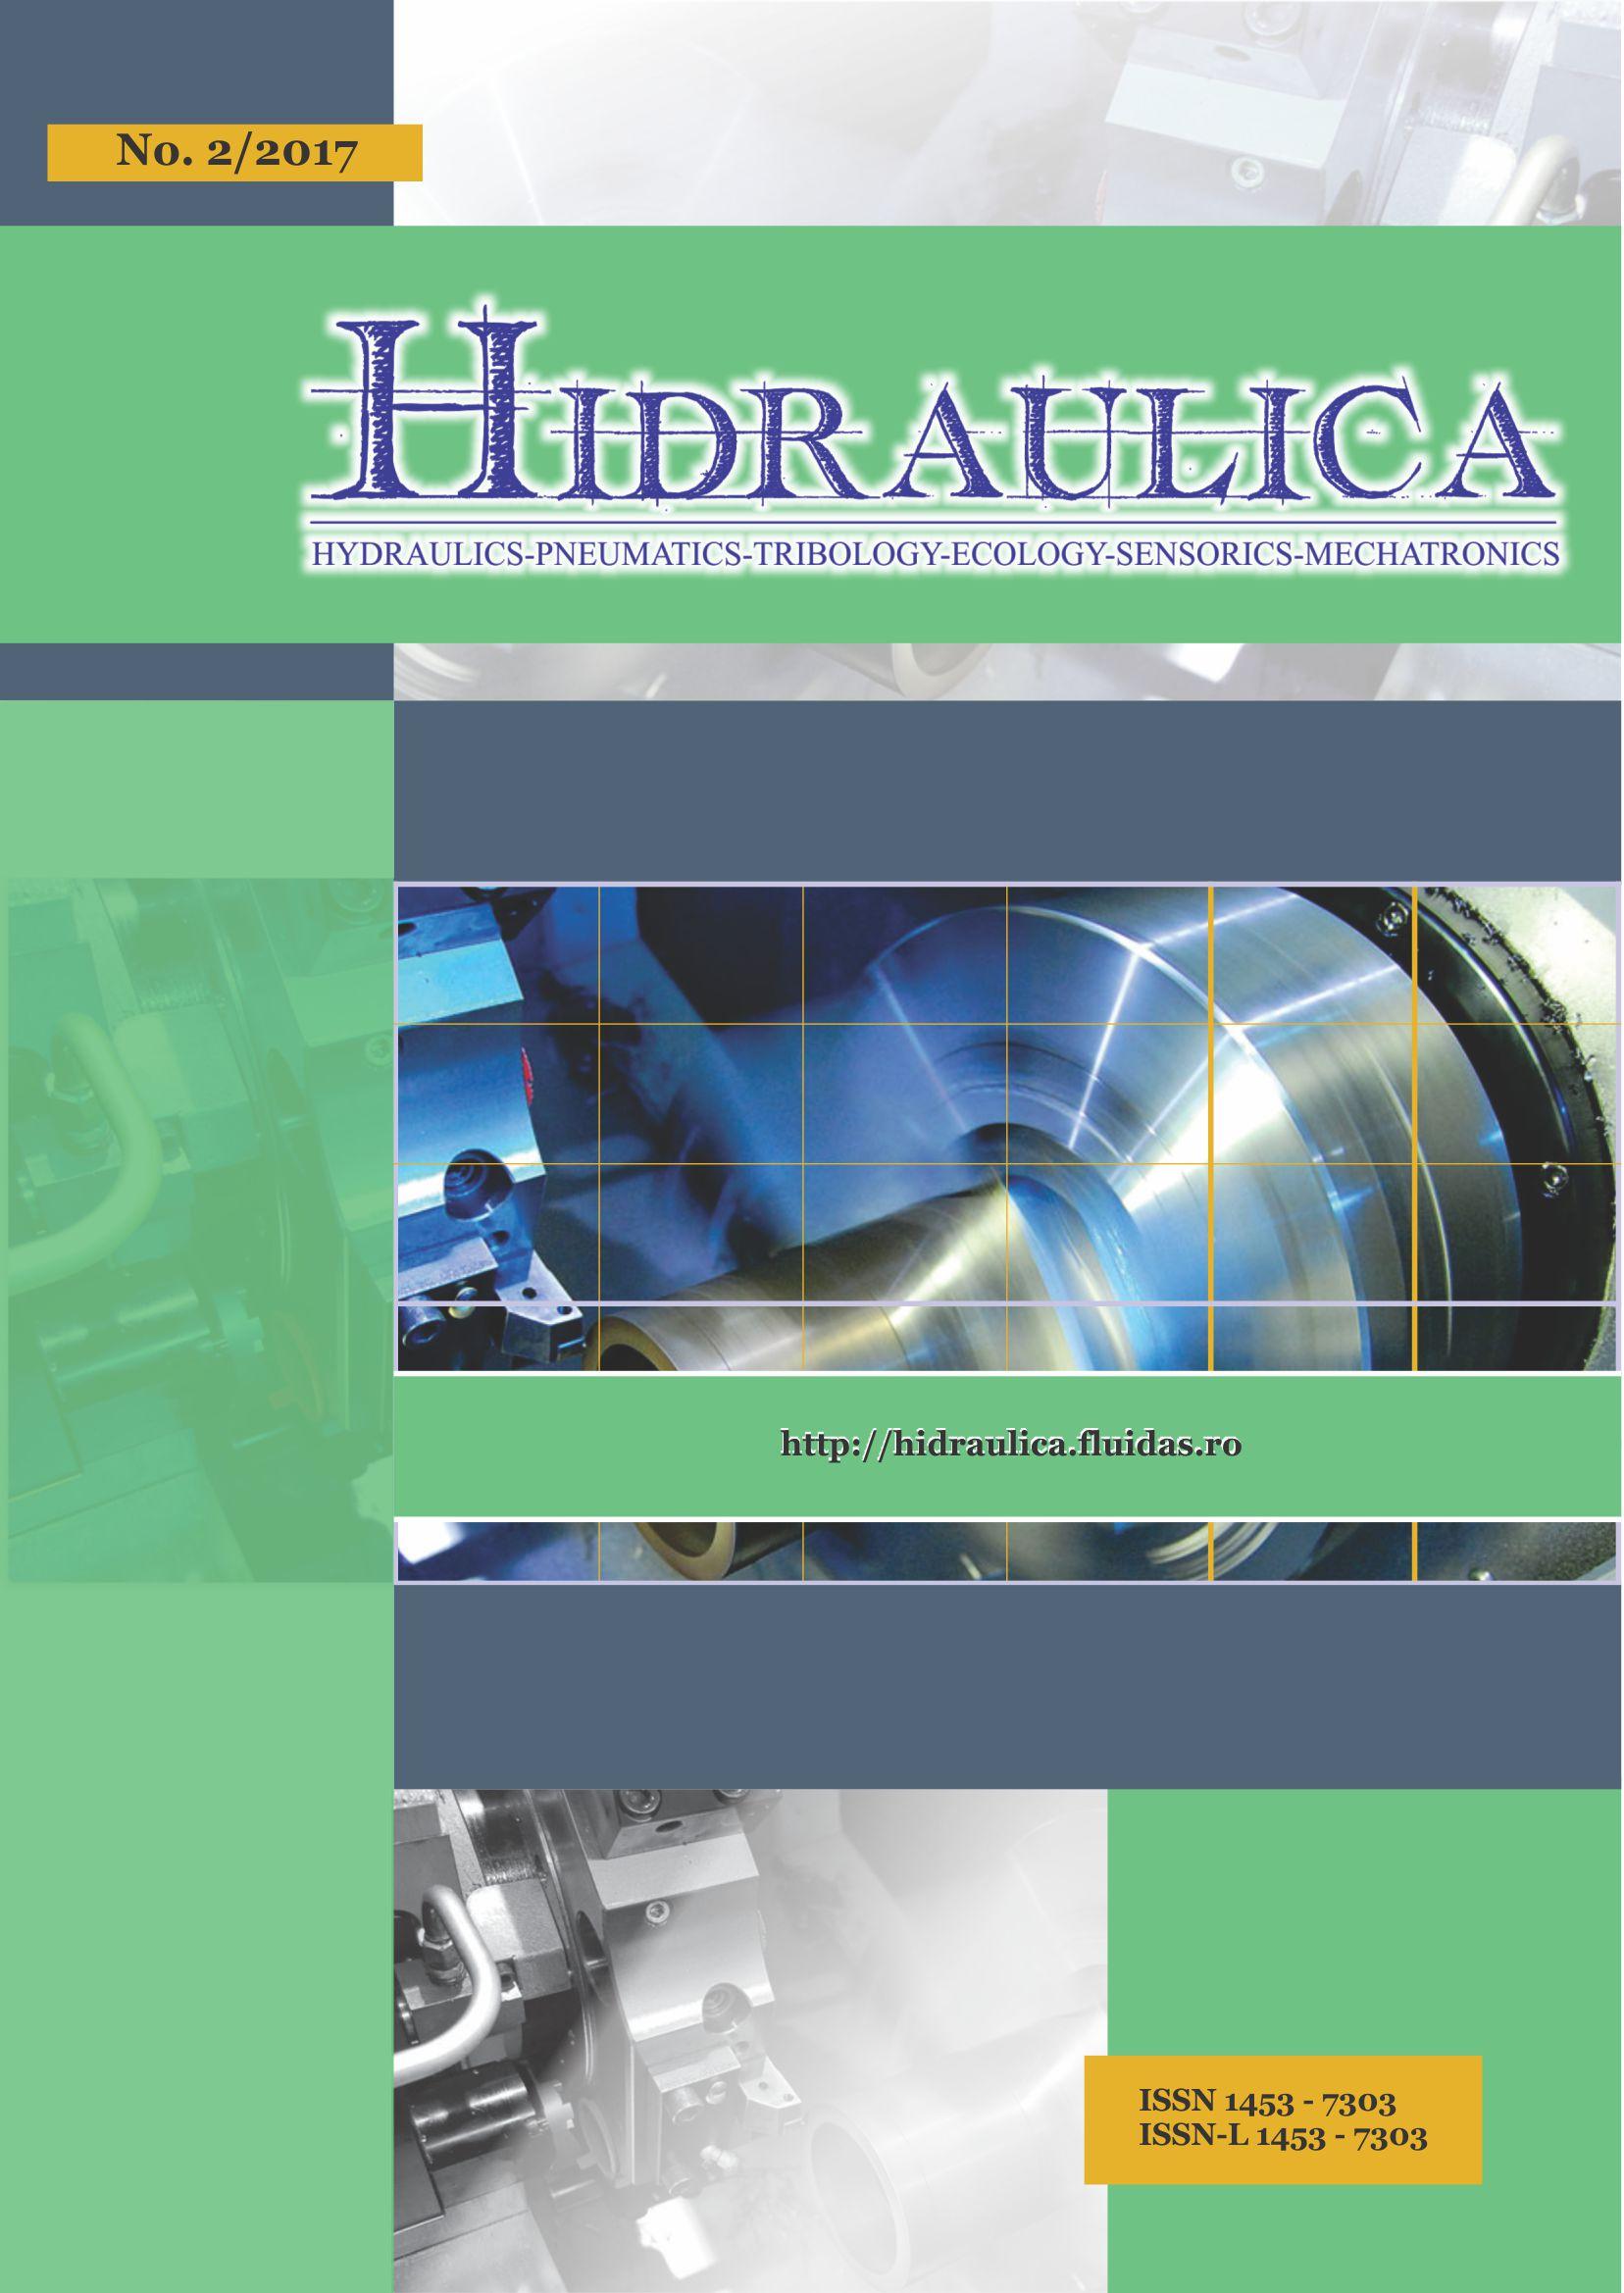 Hidraulica no.2/2017